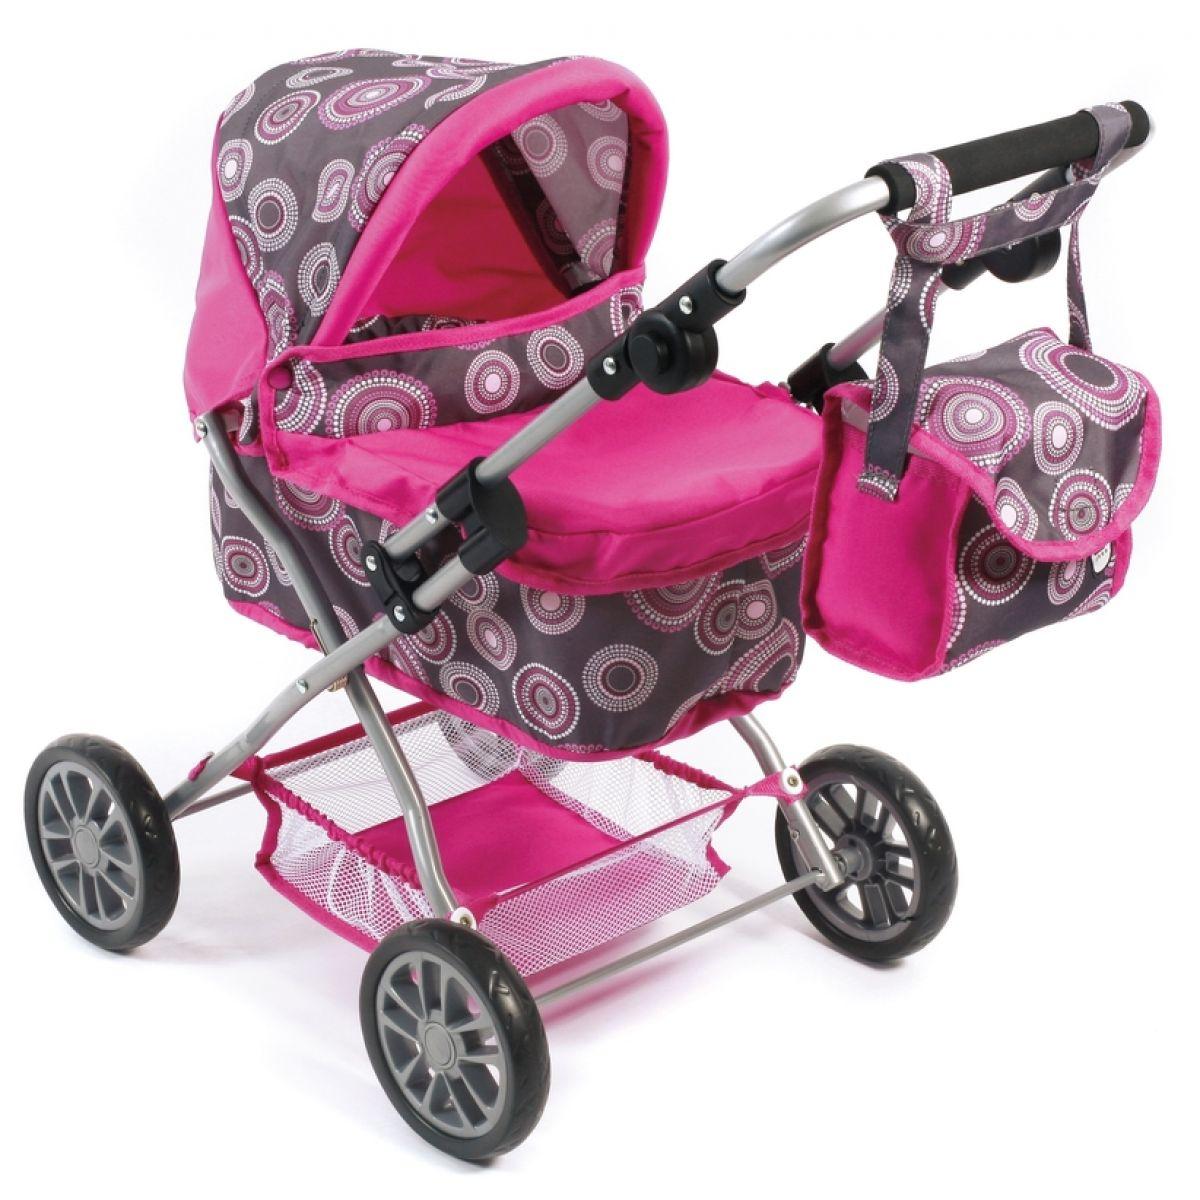 Bayer Chic Kočárek pro panenky Picobello - hot pink pearls